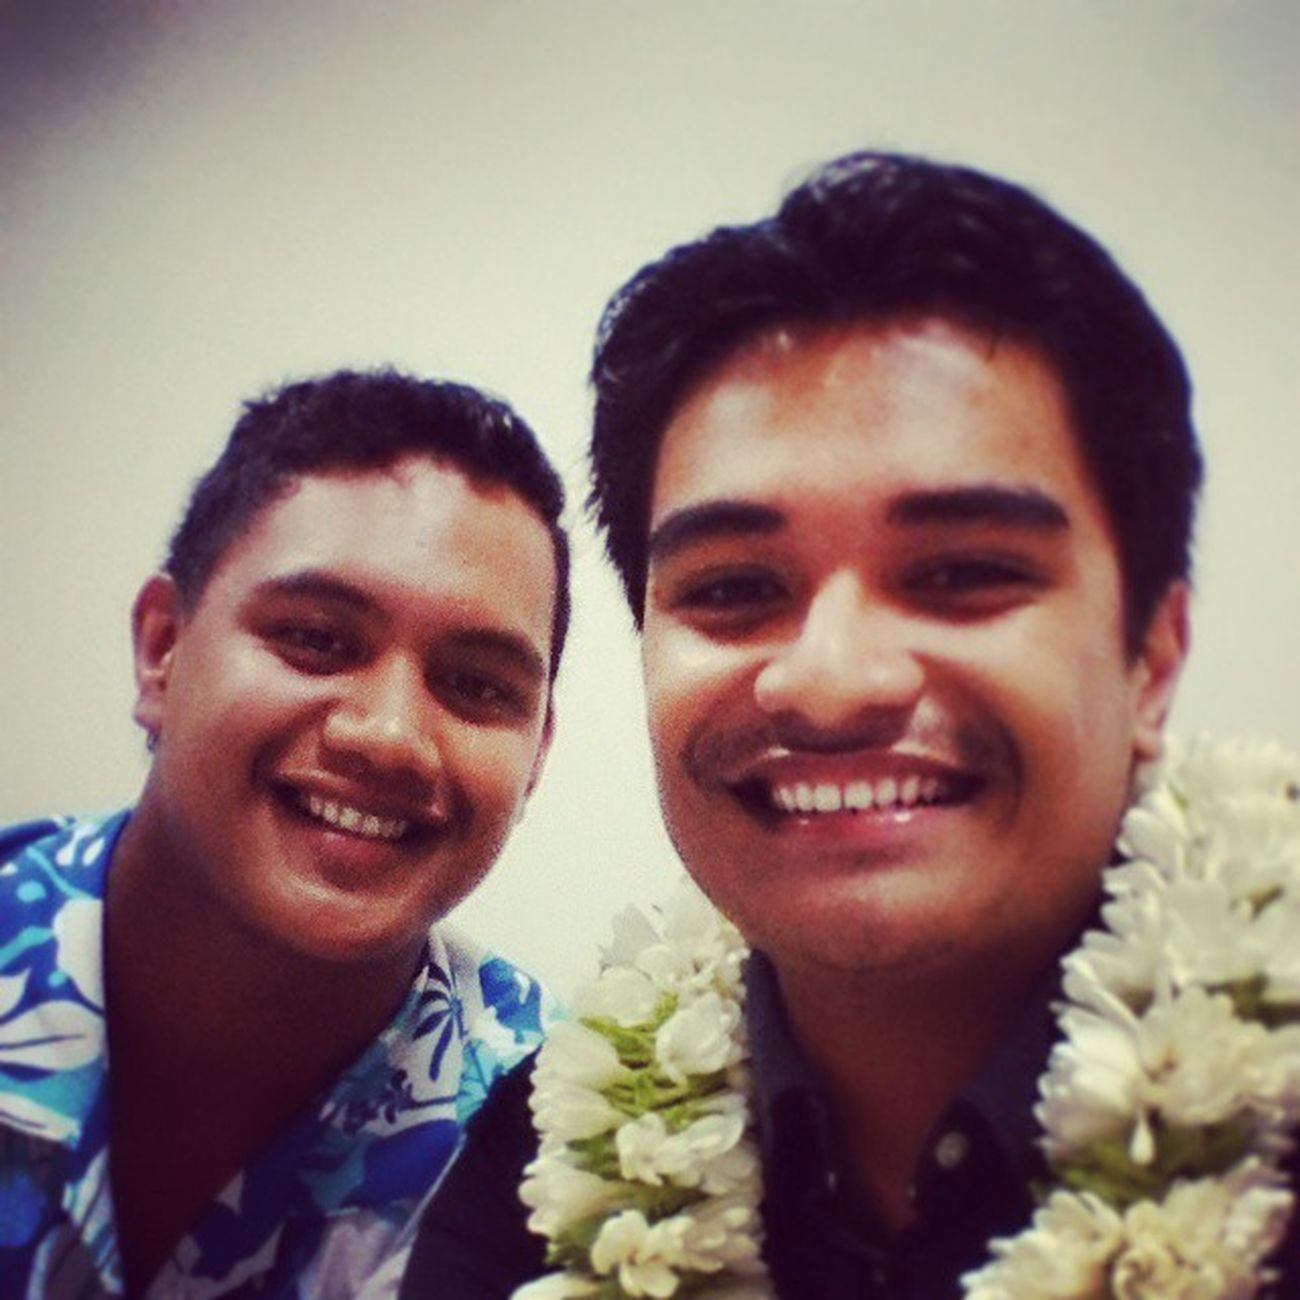 With my Friend @ da Church_party 😜